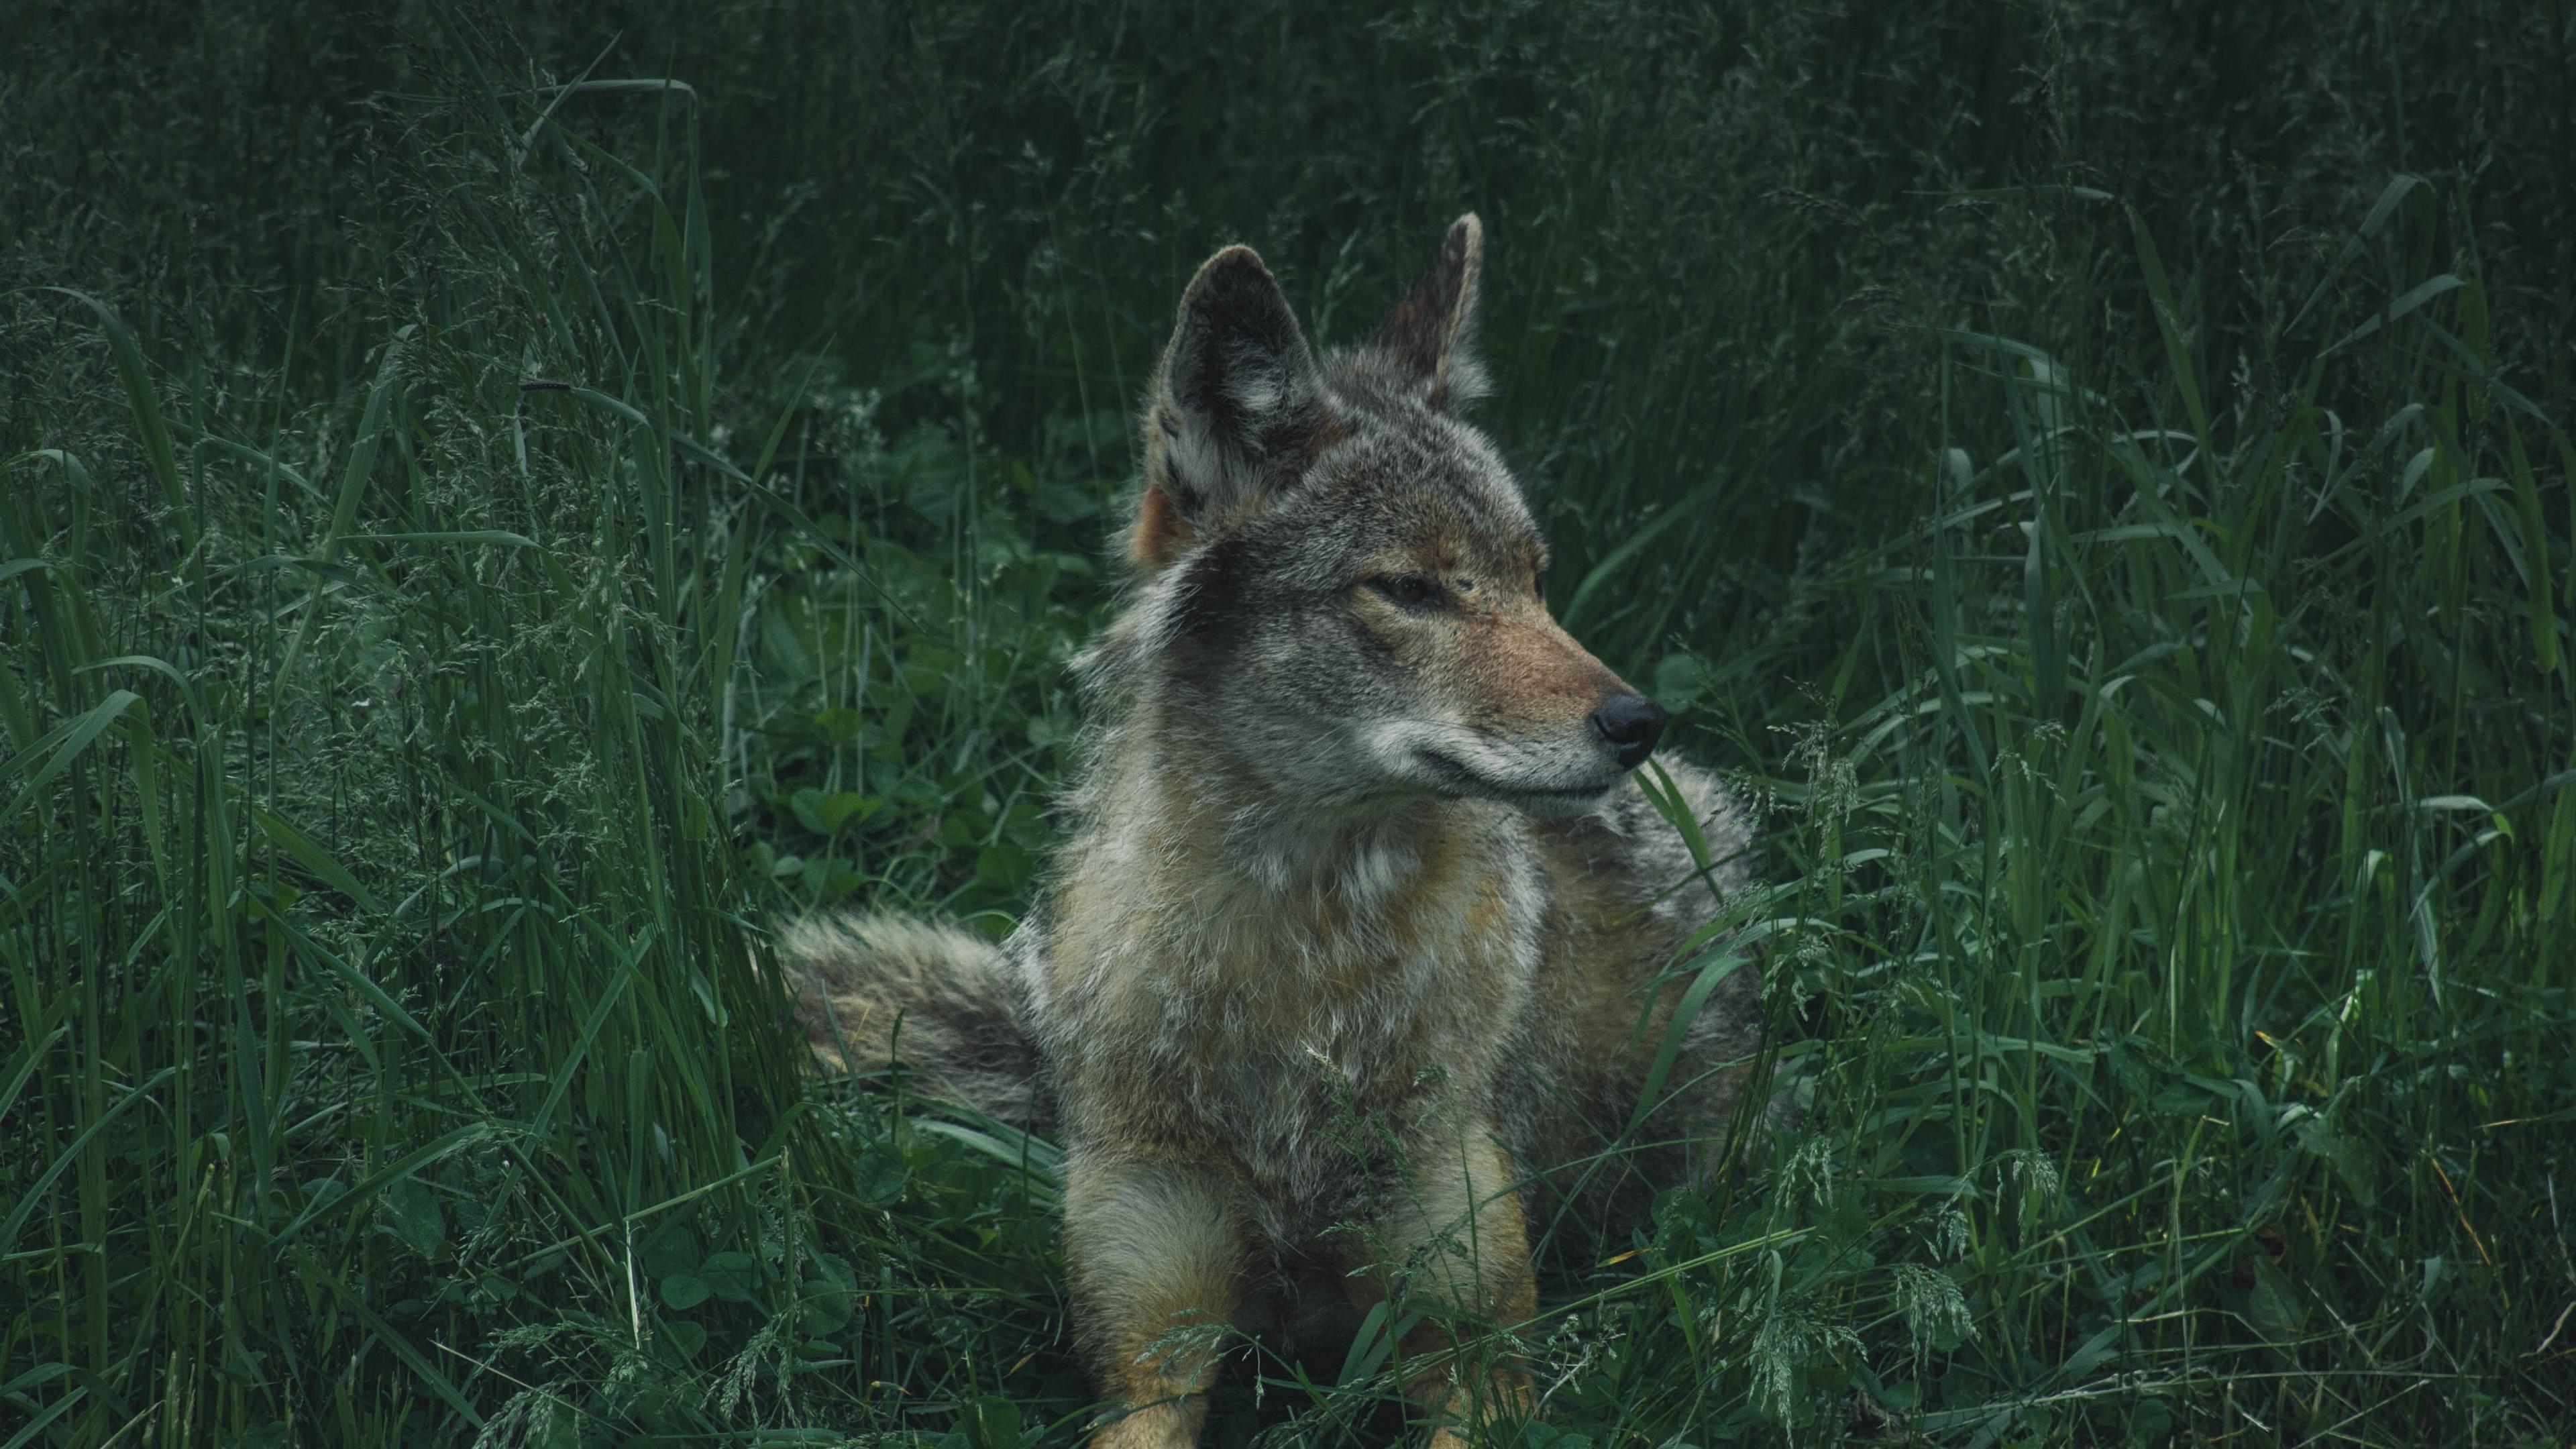 wolf predator grass 4k 1542242068 - wolf, predator, grass 4k - Wolf, Predator, Grass